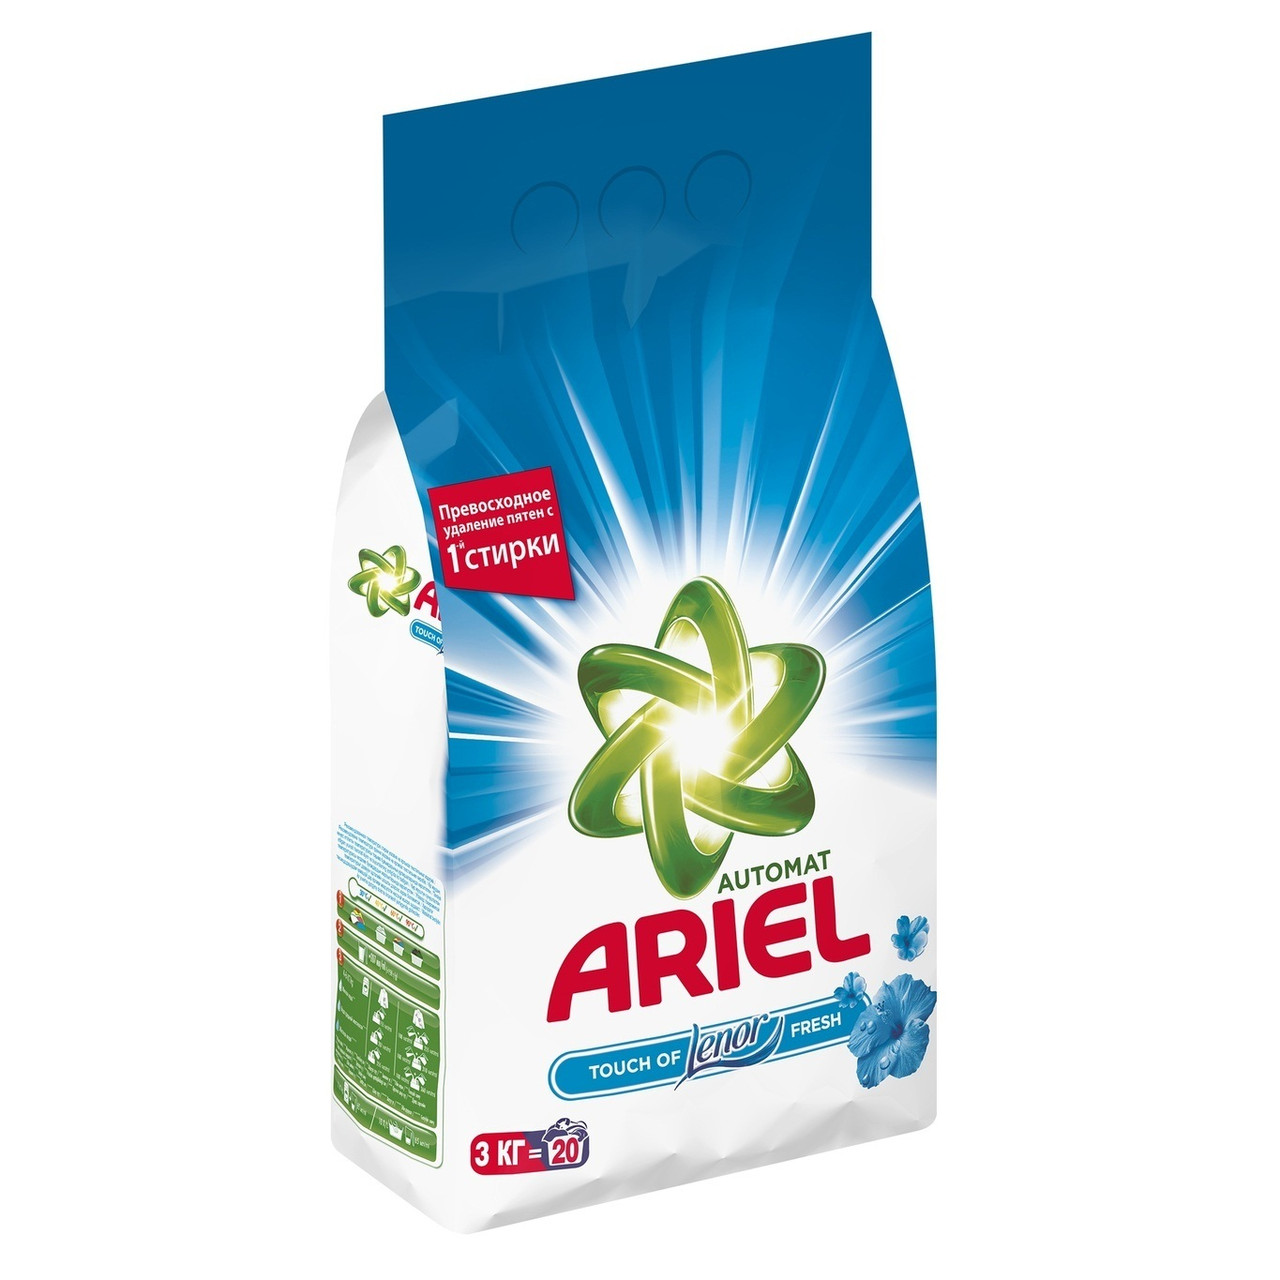 Порошок пральний Ariel автомат 3кг